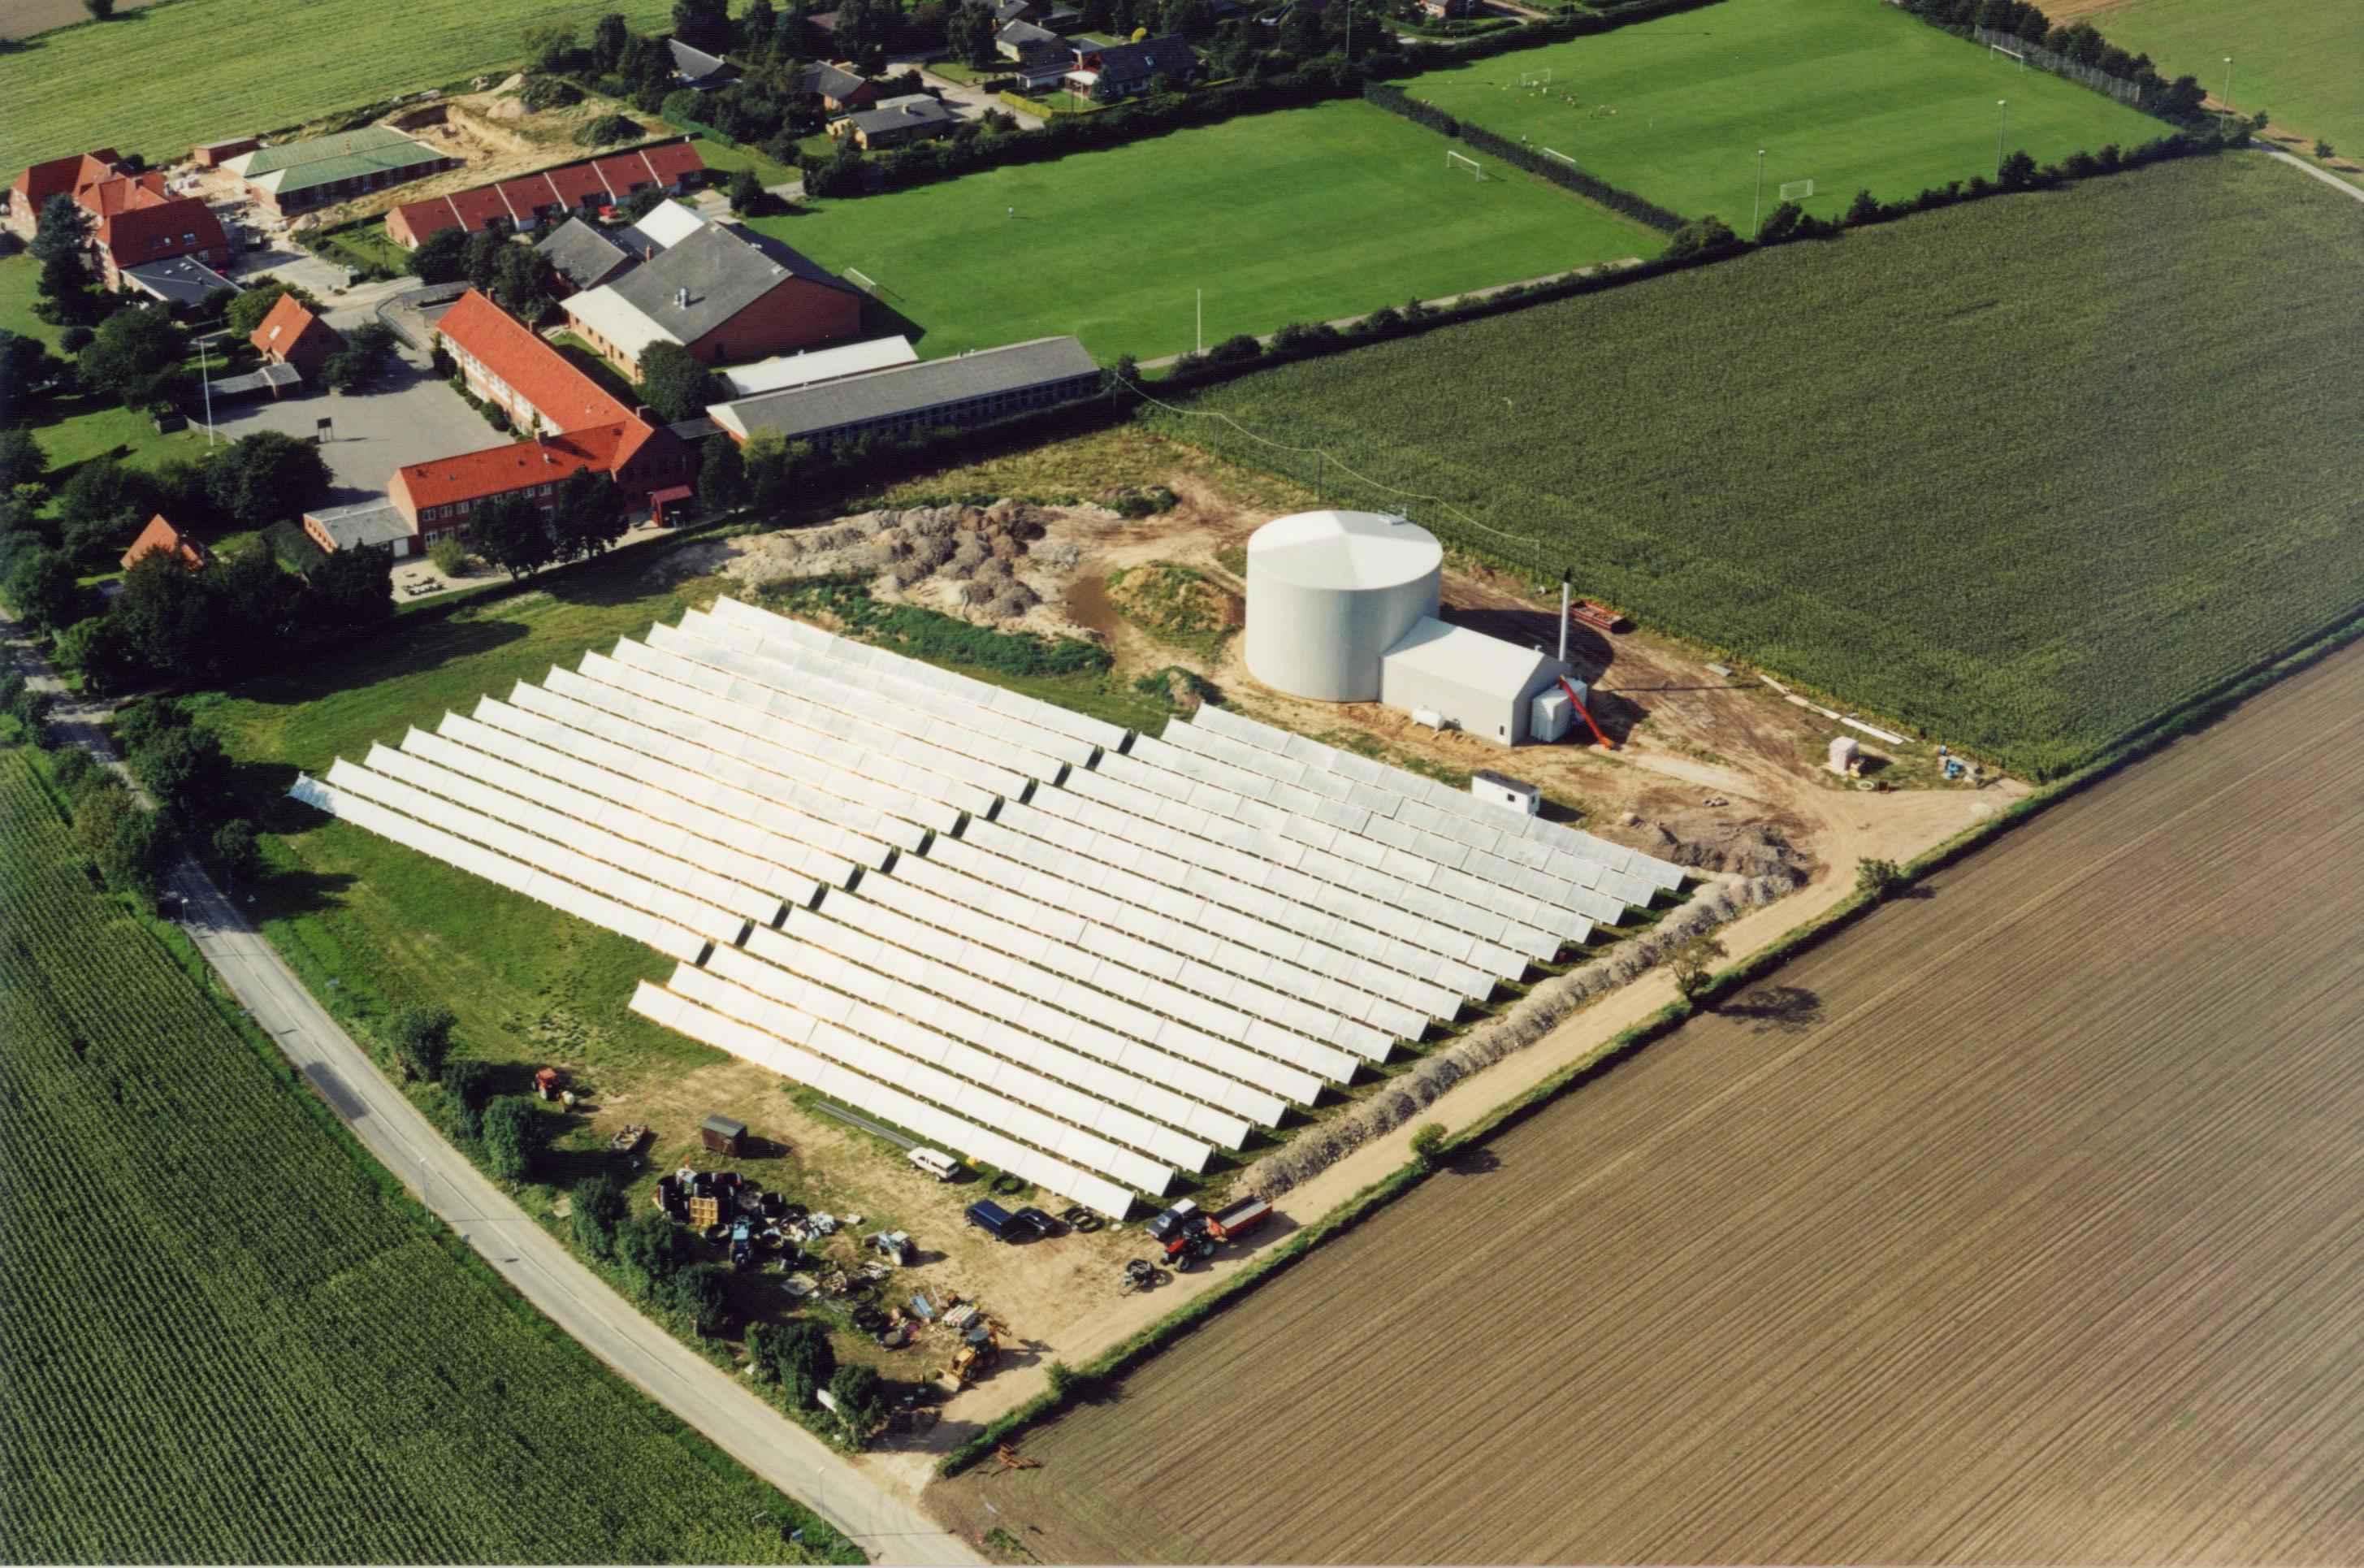 Batec Solar Heat Europe – 2520 kWth district heating in Rise, Denmark